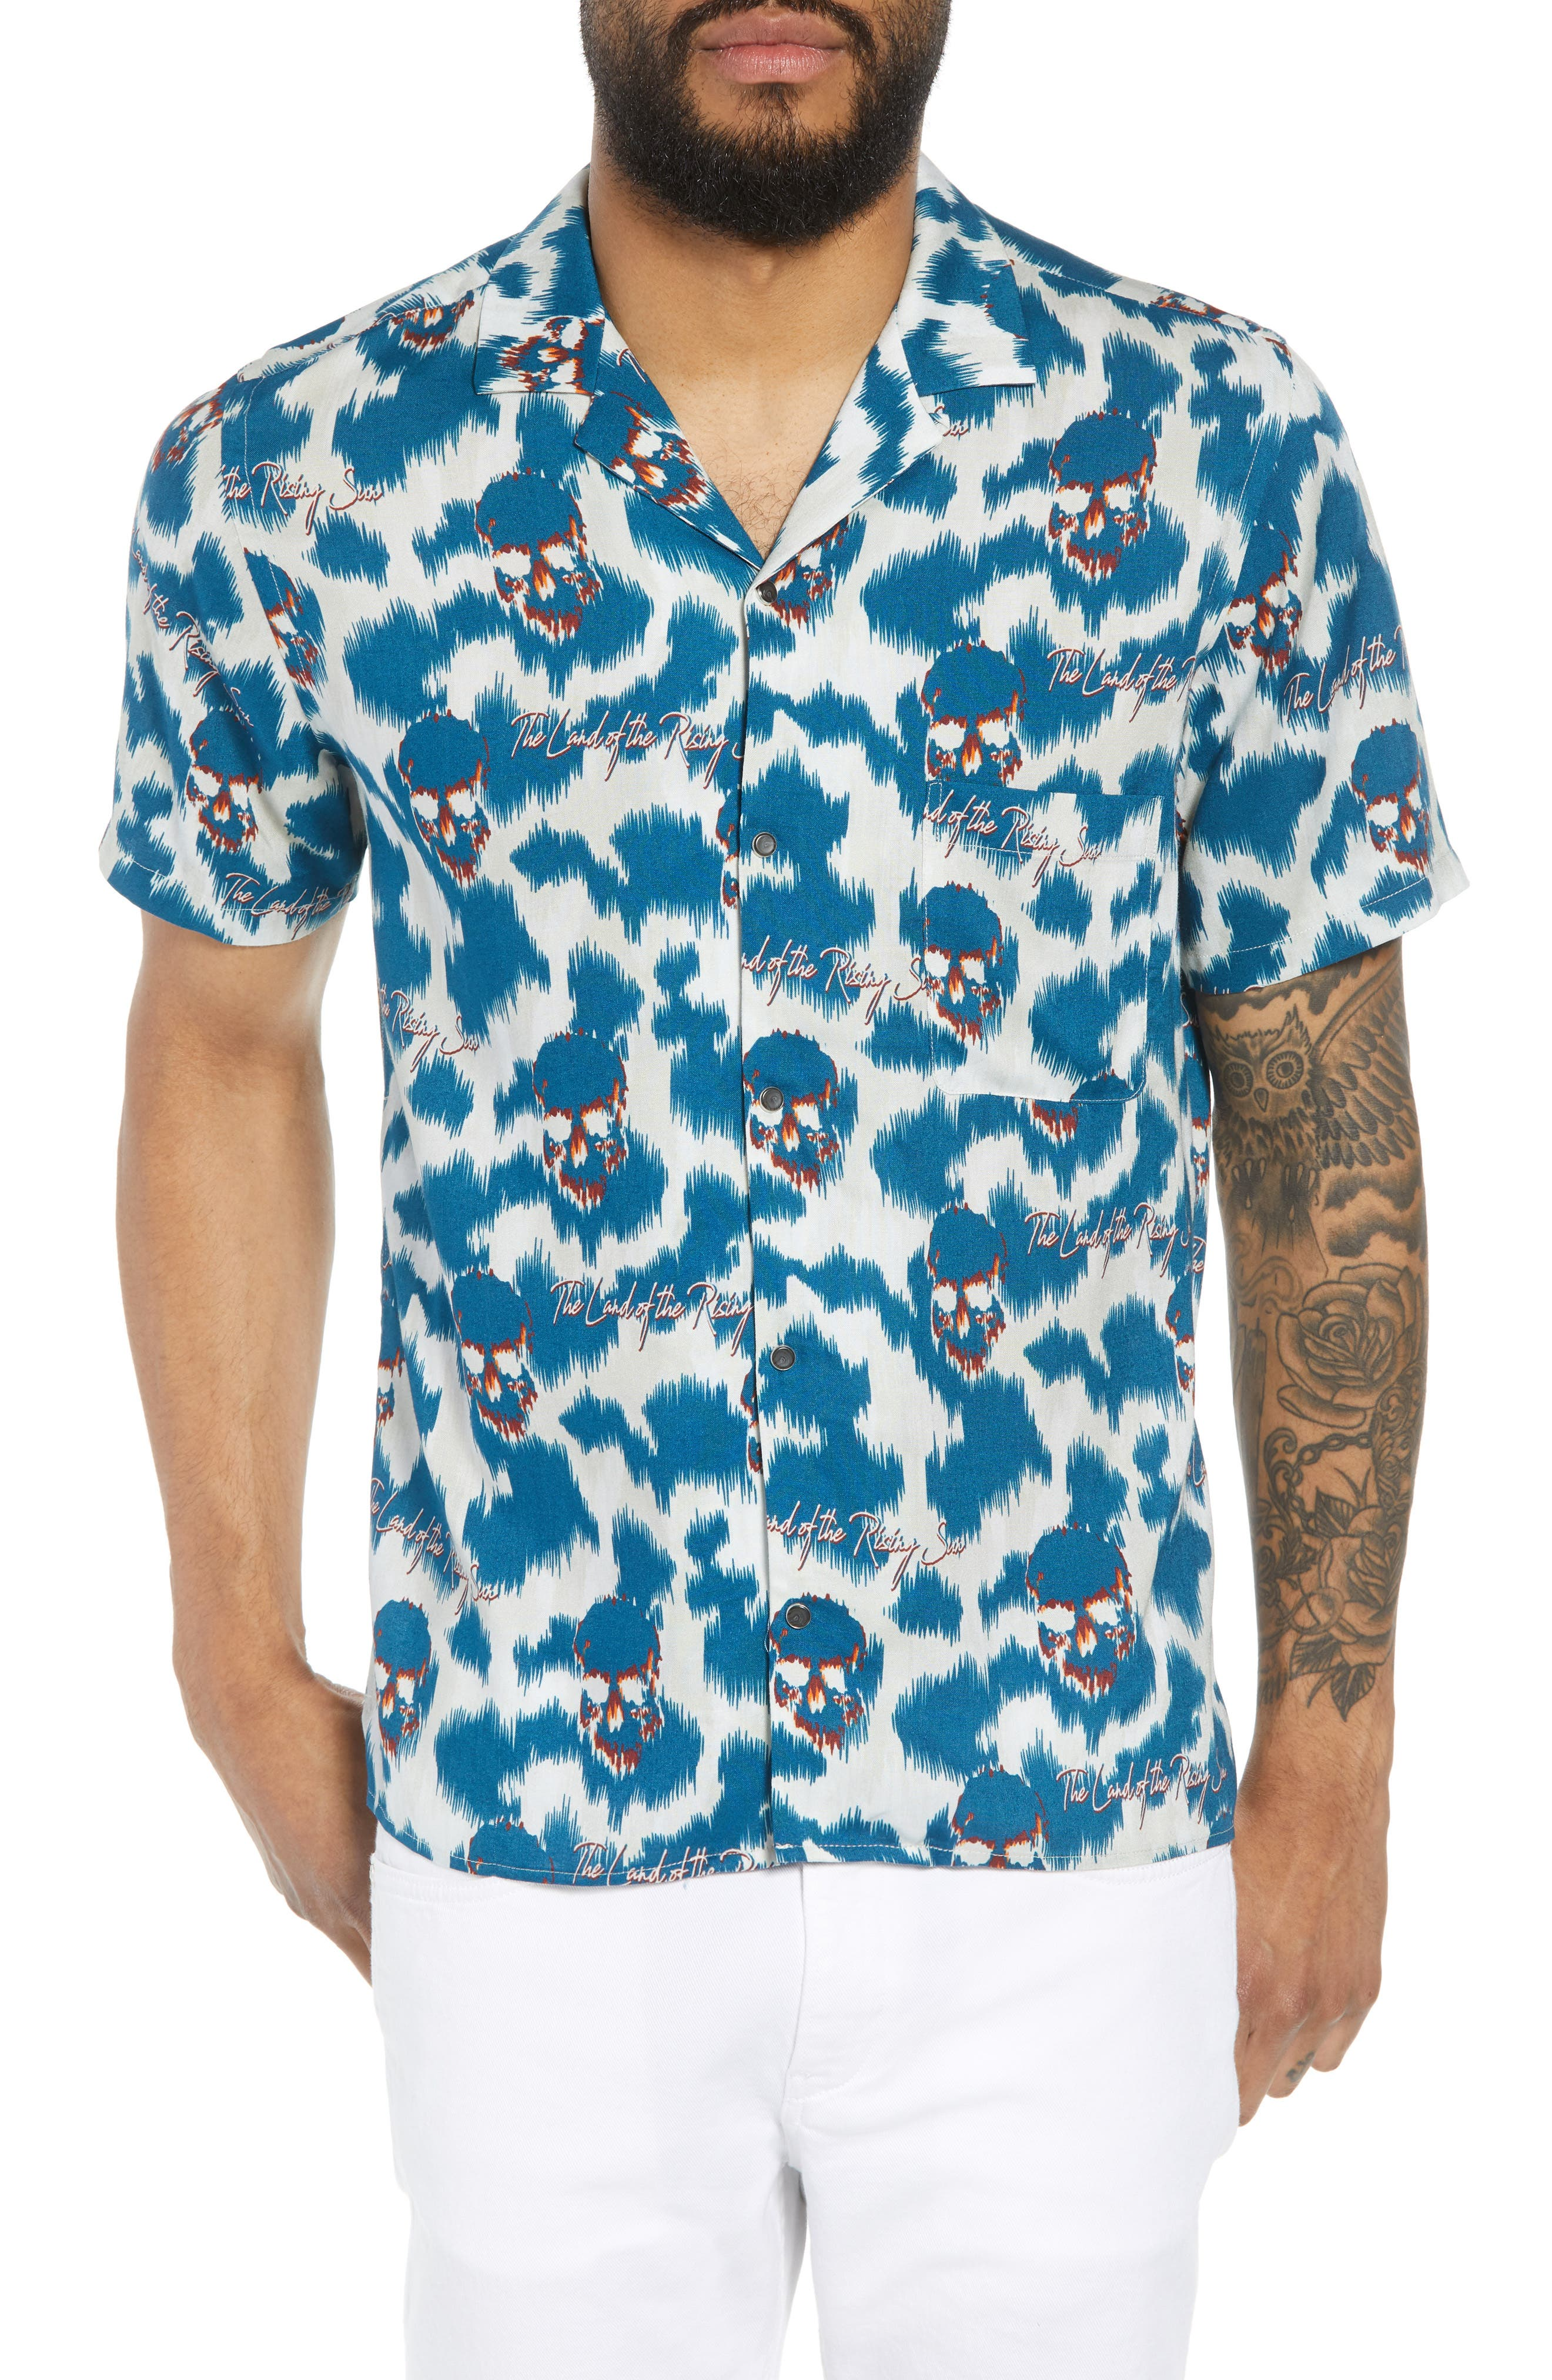 THE KOOPLES,                             Regular Fit Hawaiian Shirt,                             Main thumbnail 1, color,                             400